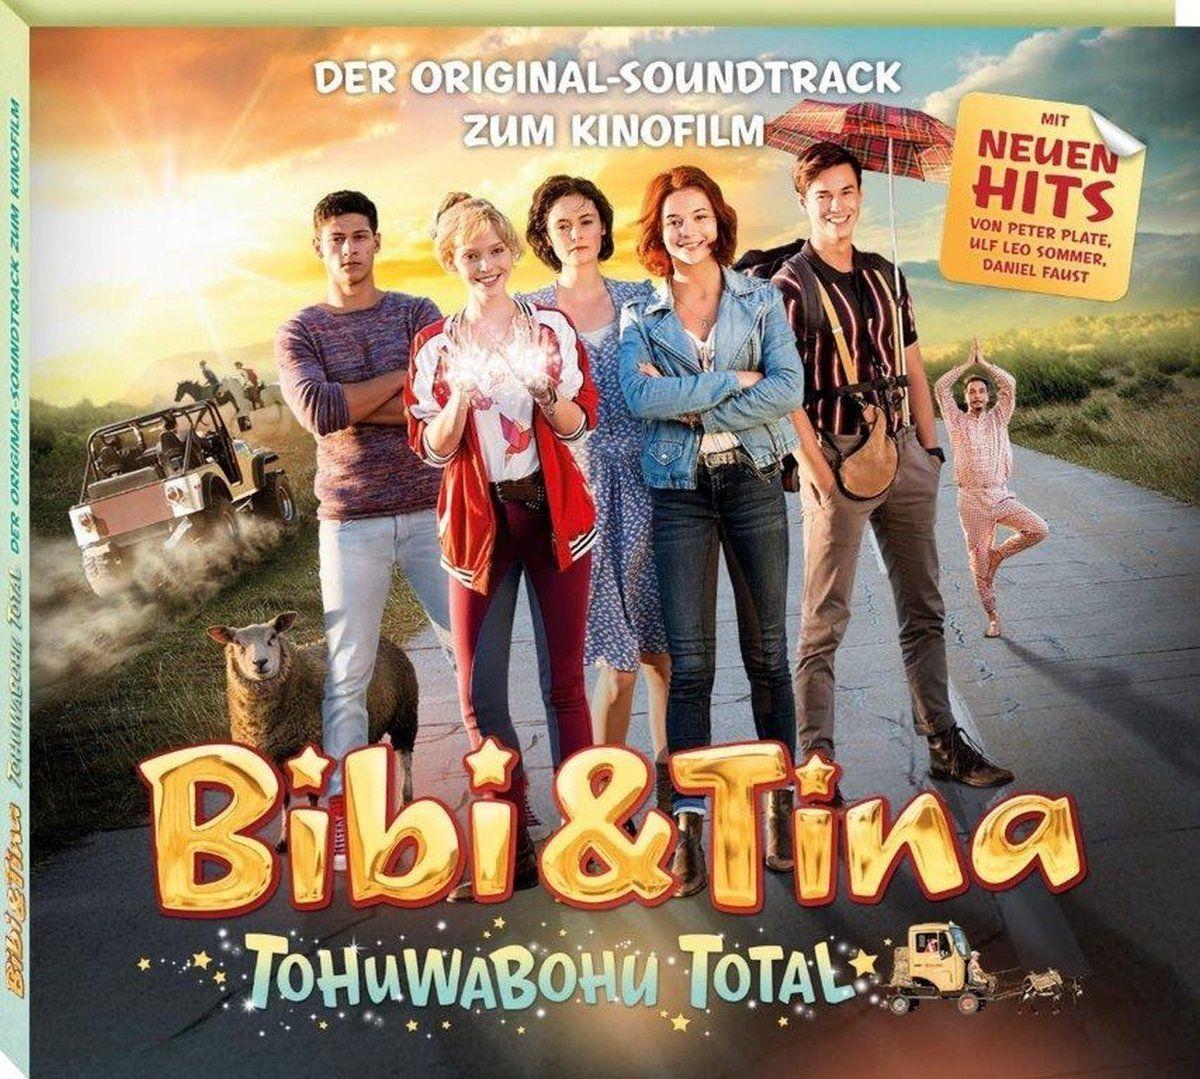 Bibi und Tina 4 Soundtrack  Vorverkauf zum 24.02.2017